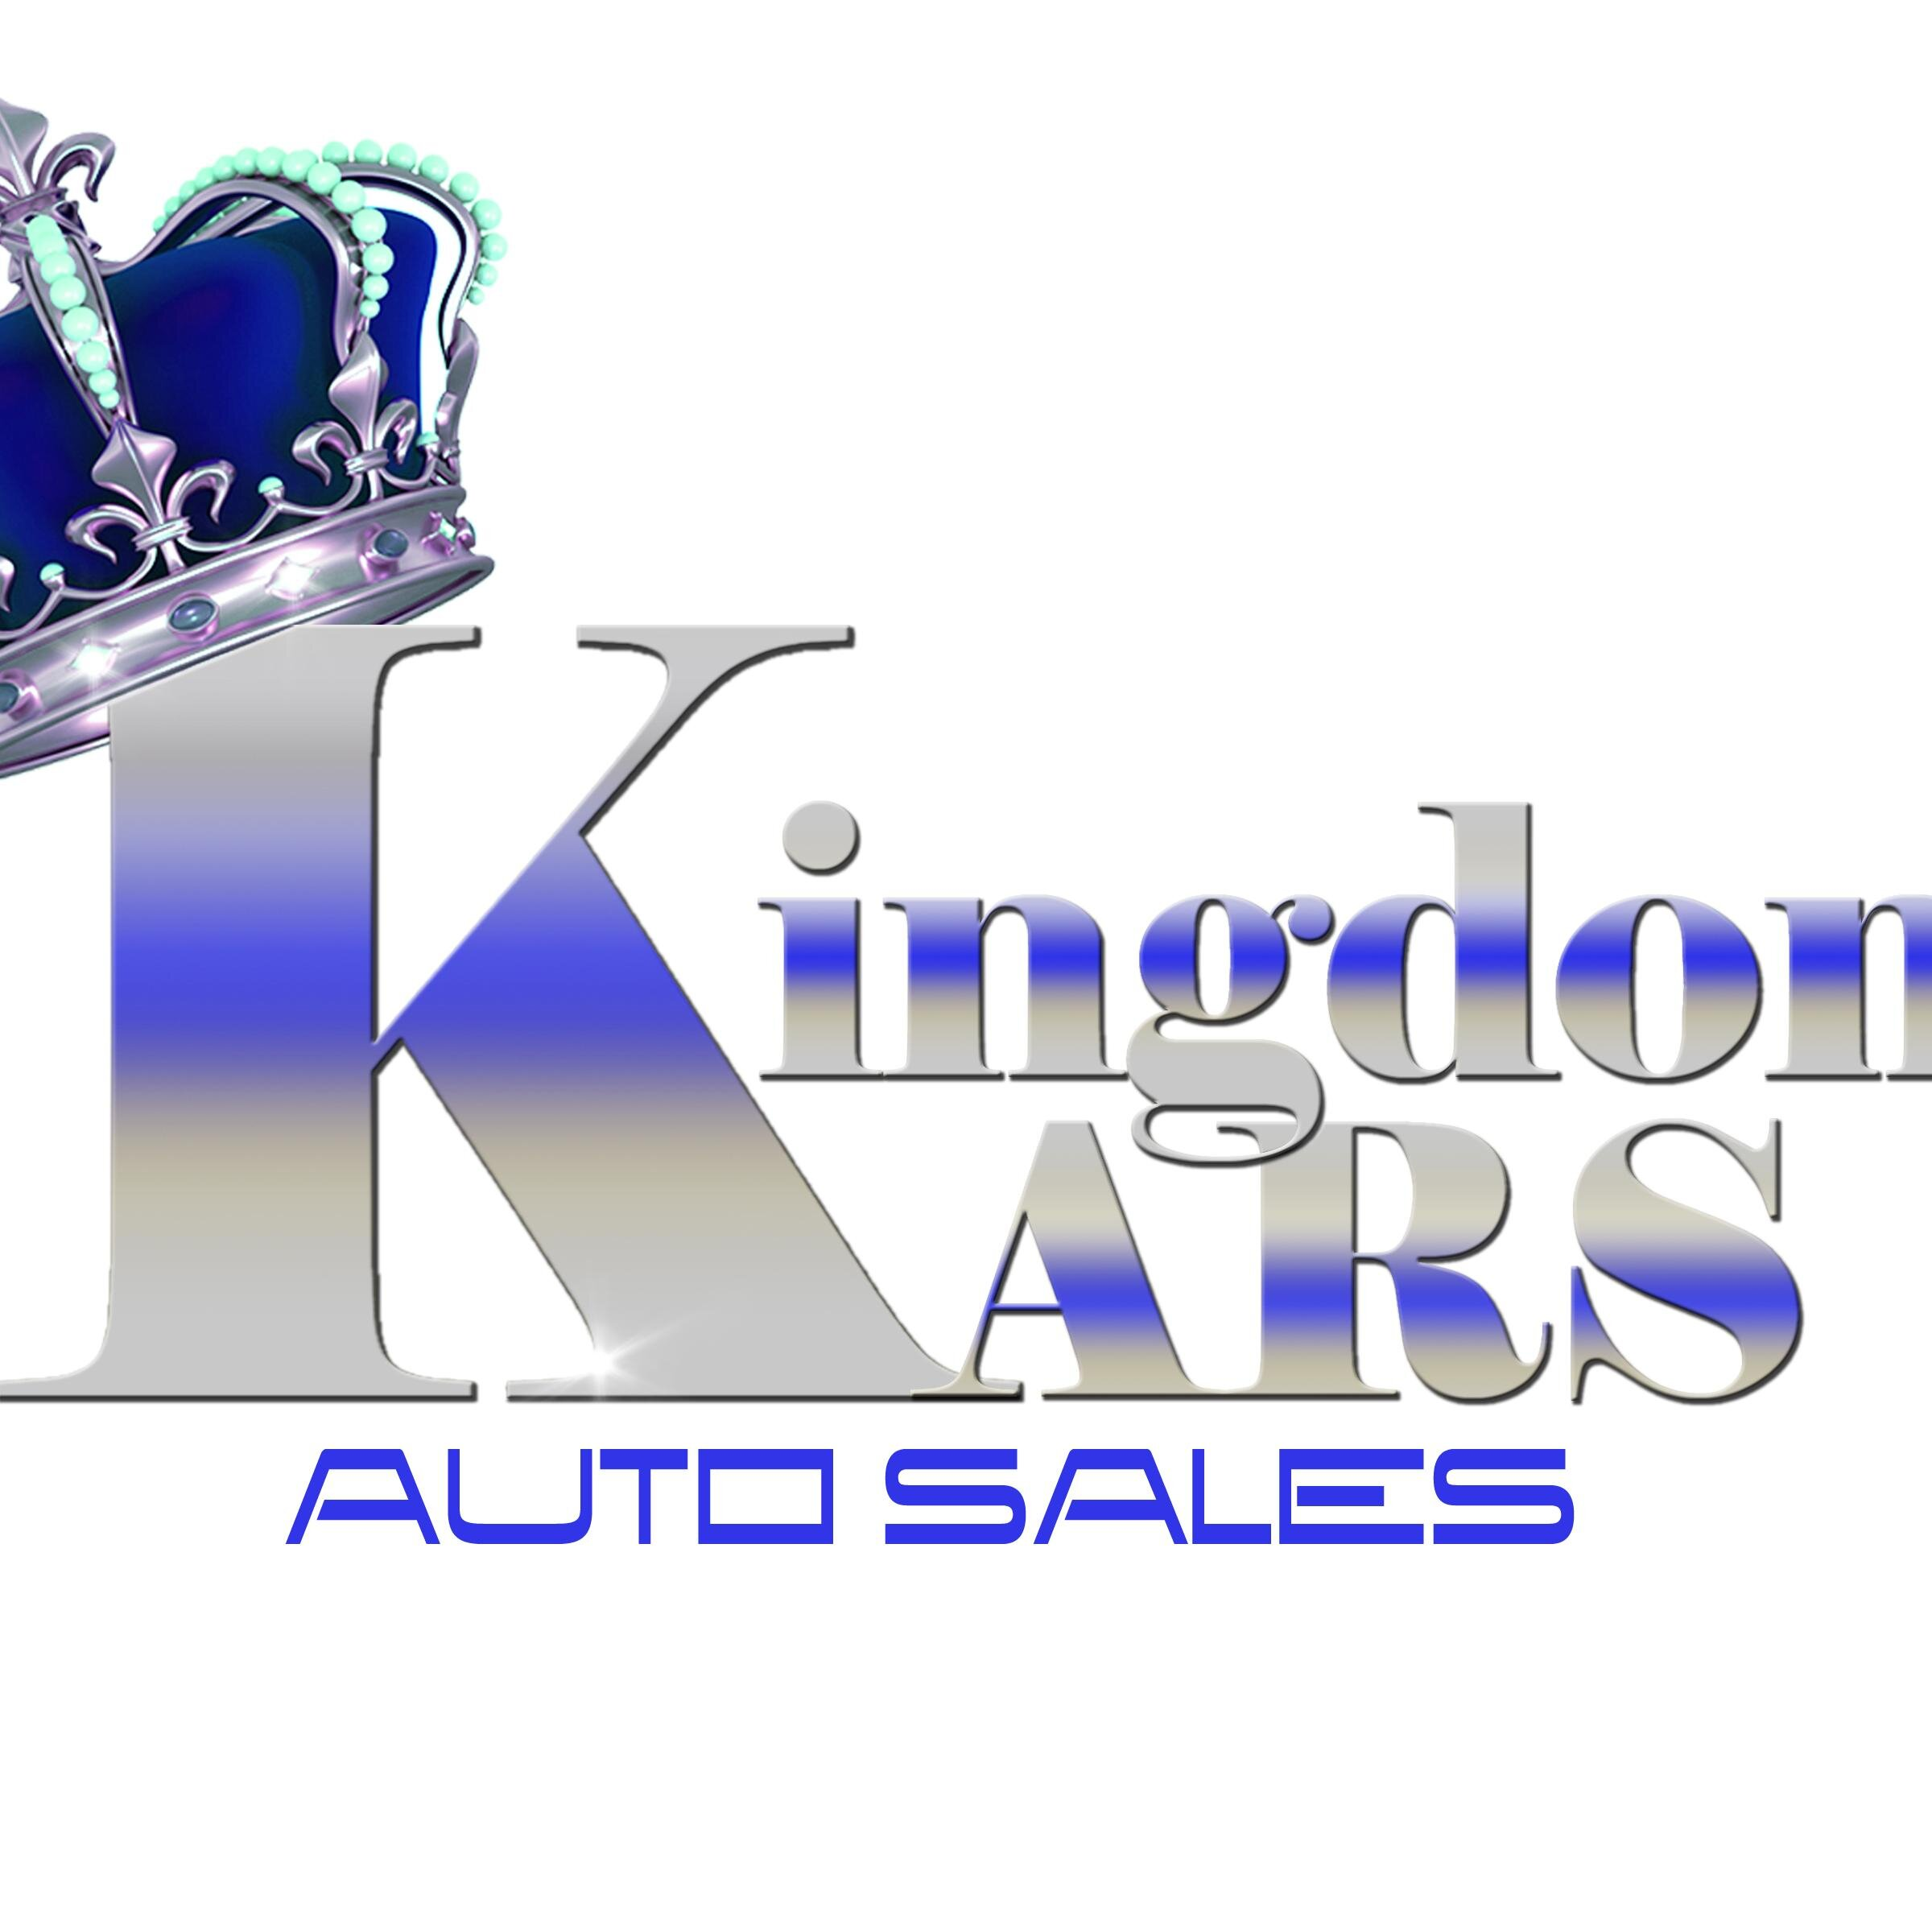 Kingdom Auto Sales >> Kingdom Kars Kingdomkars Twitter